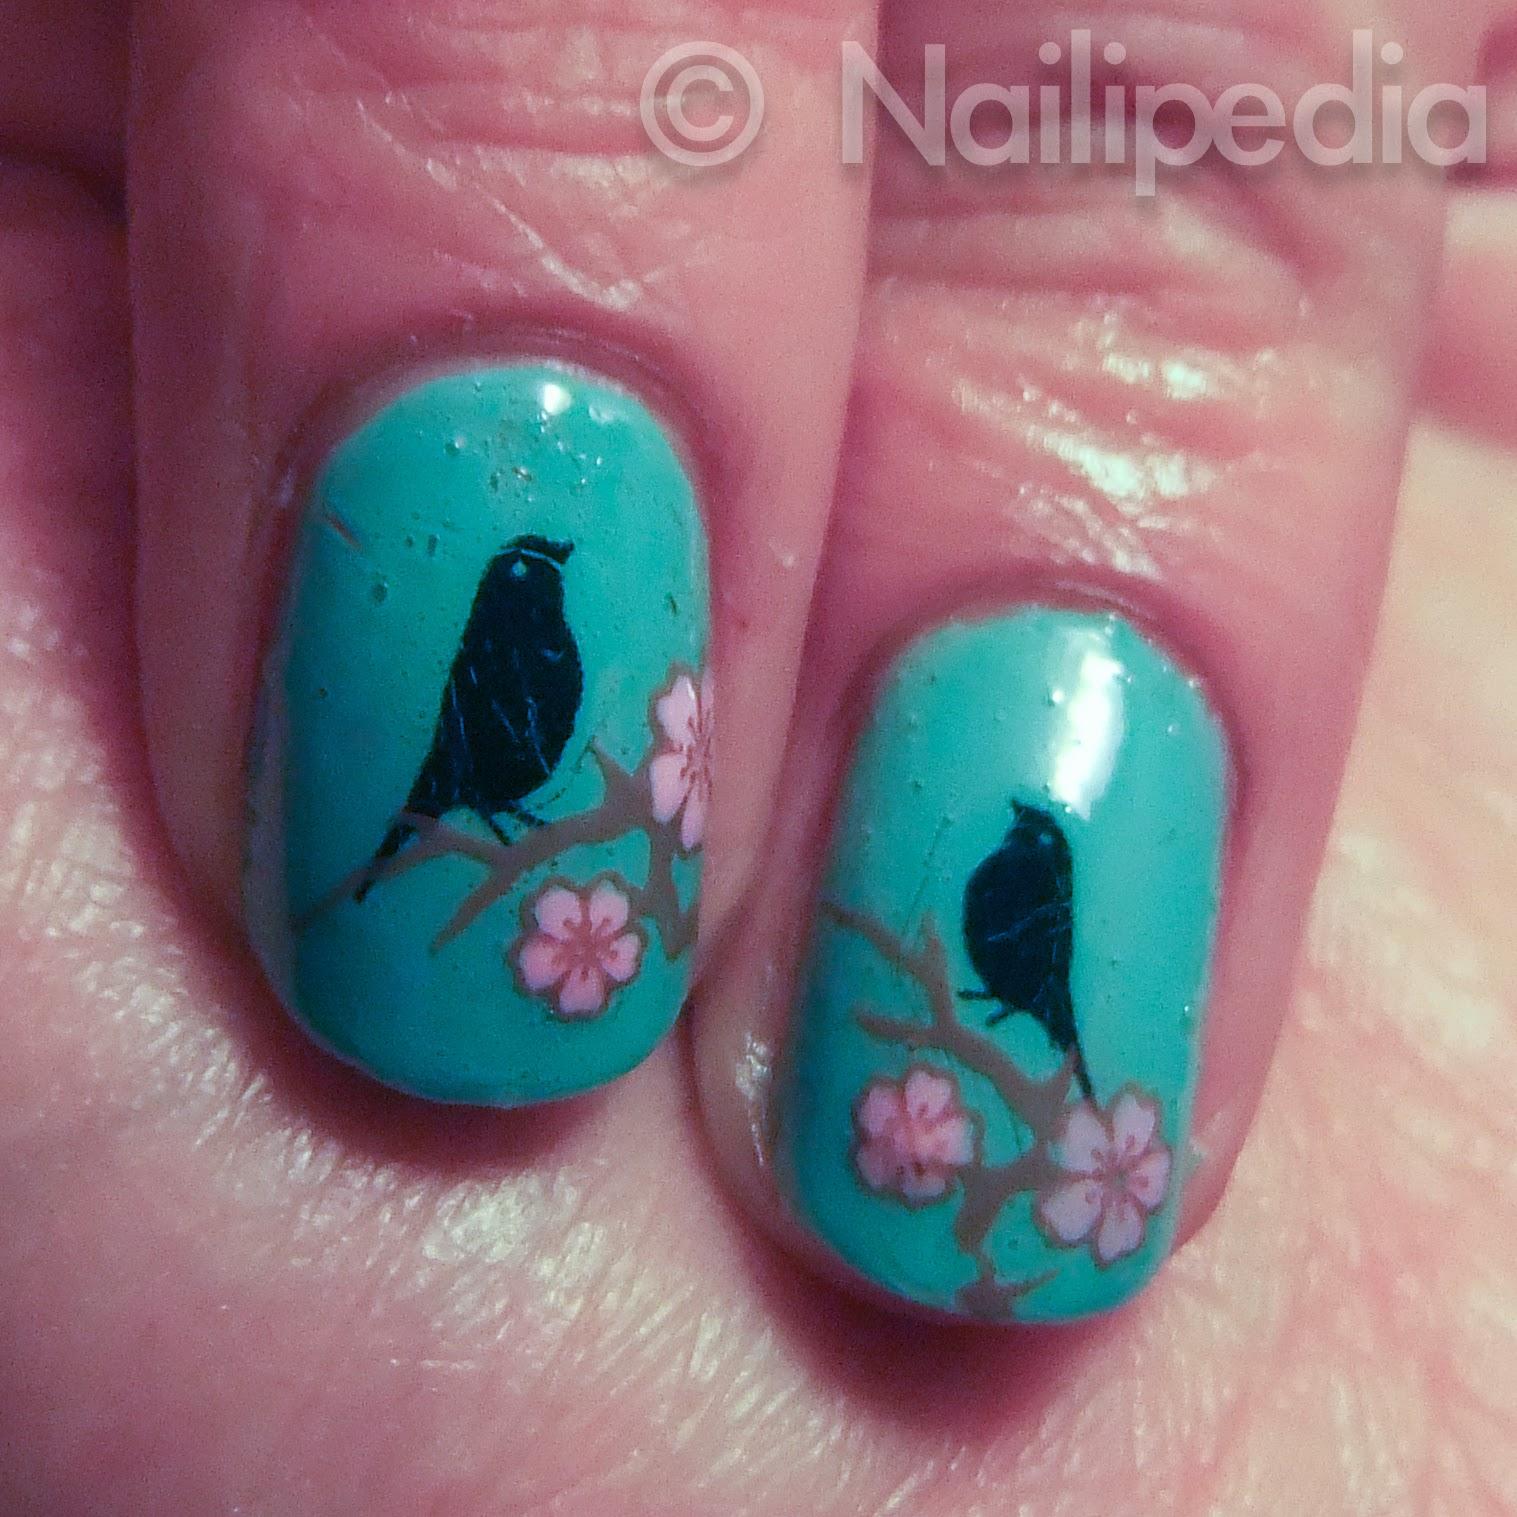 Nailipedia love birds fake tattoos review for How to get fake tattoos off